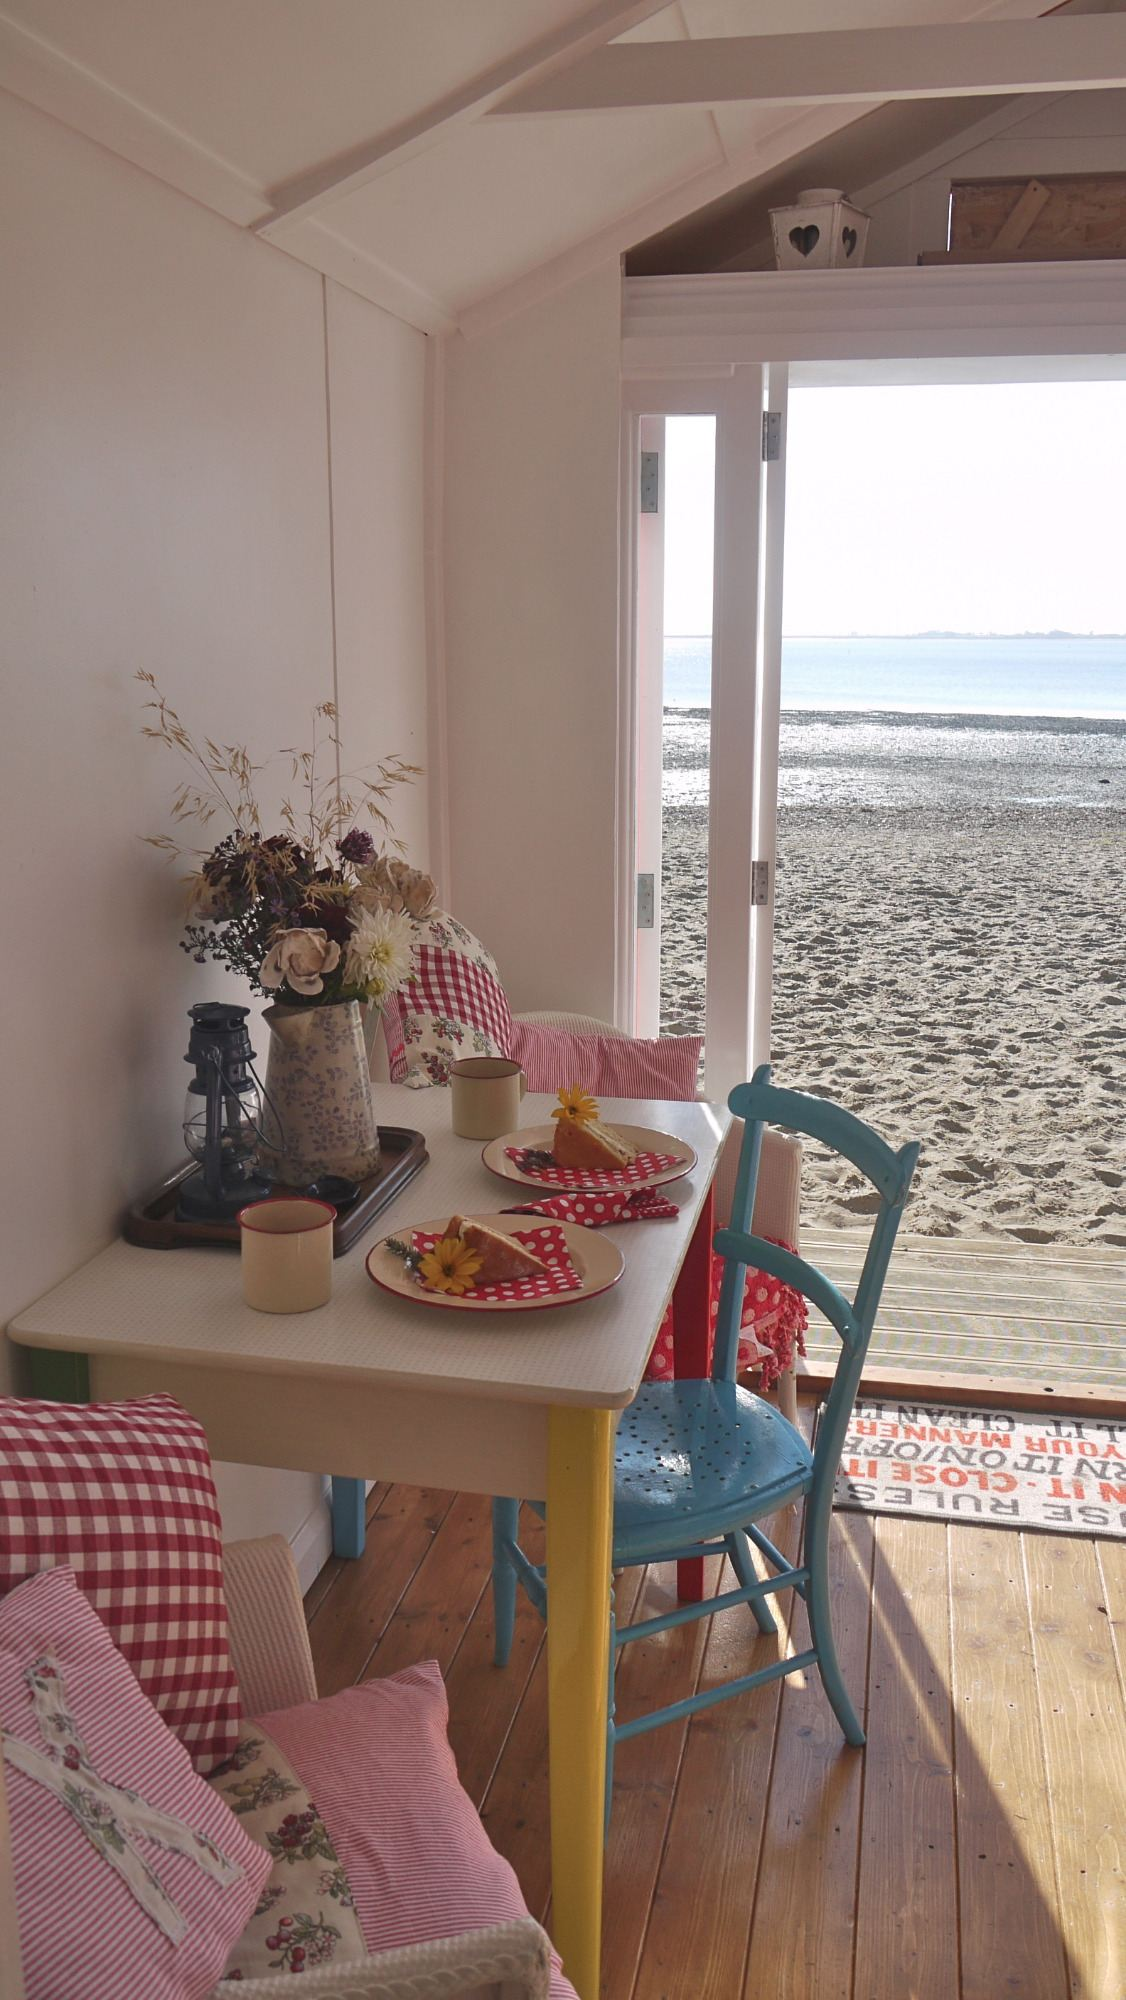 Gallery for Beach house ideas uk